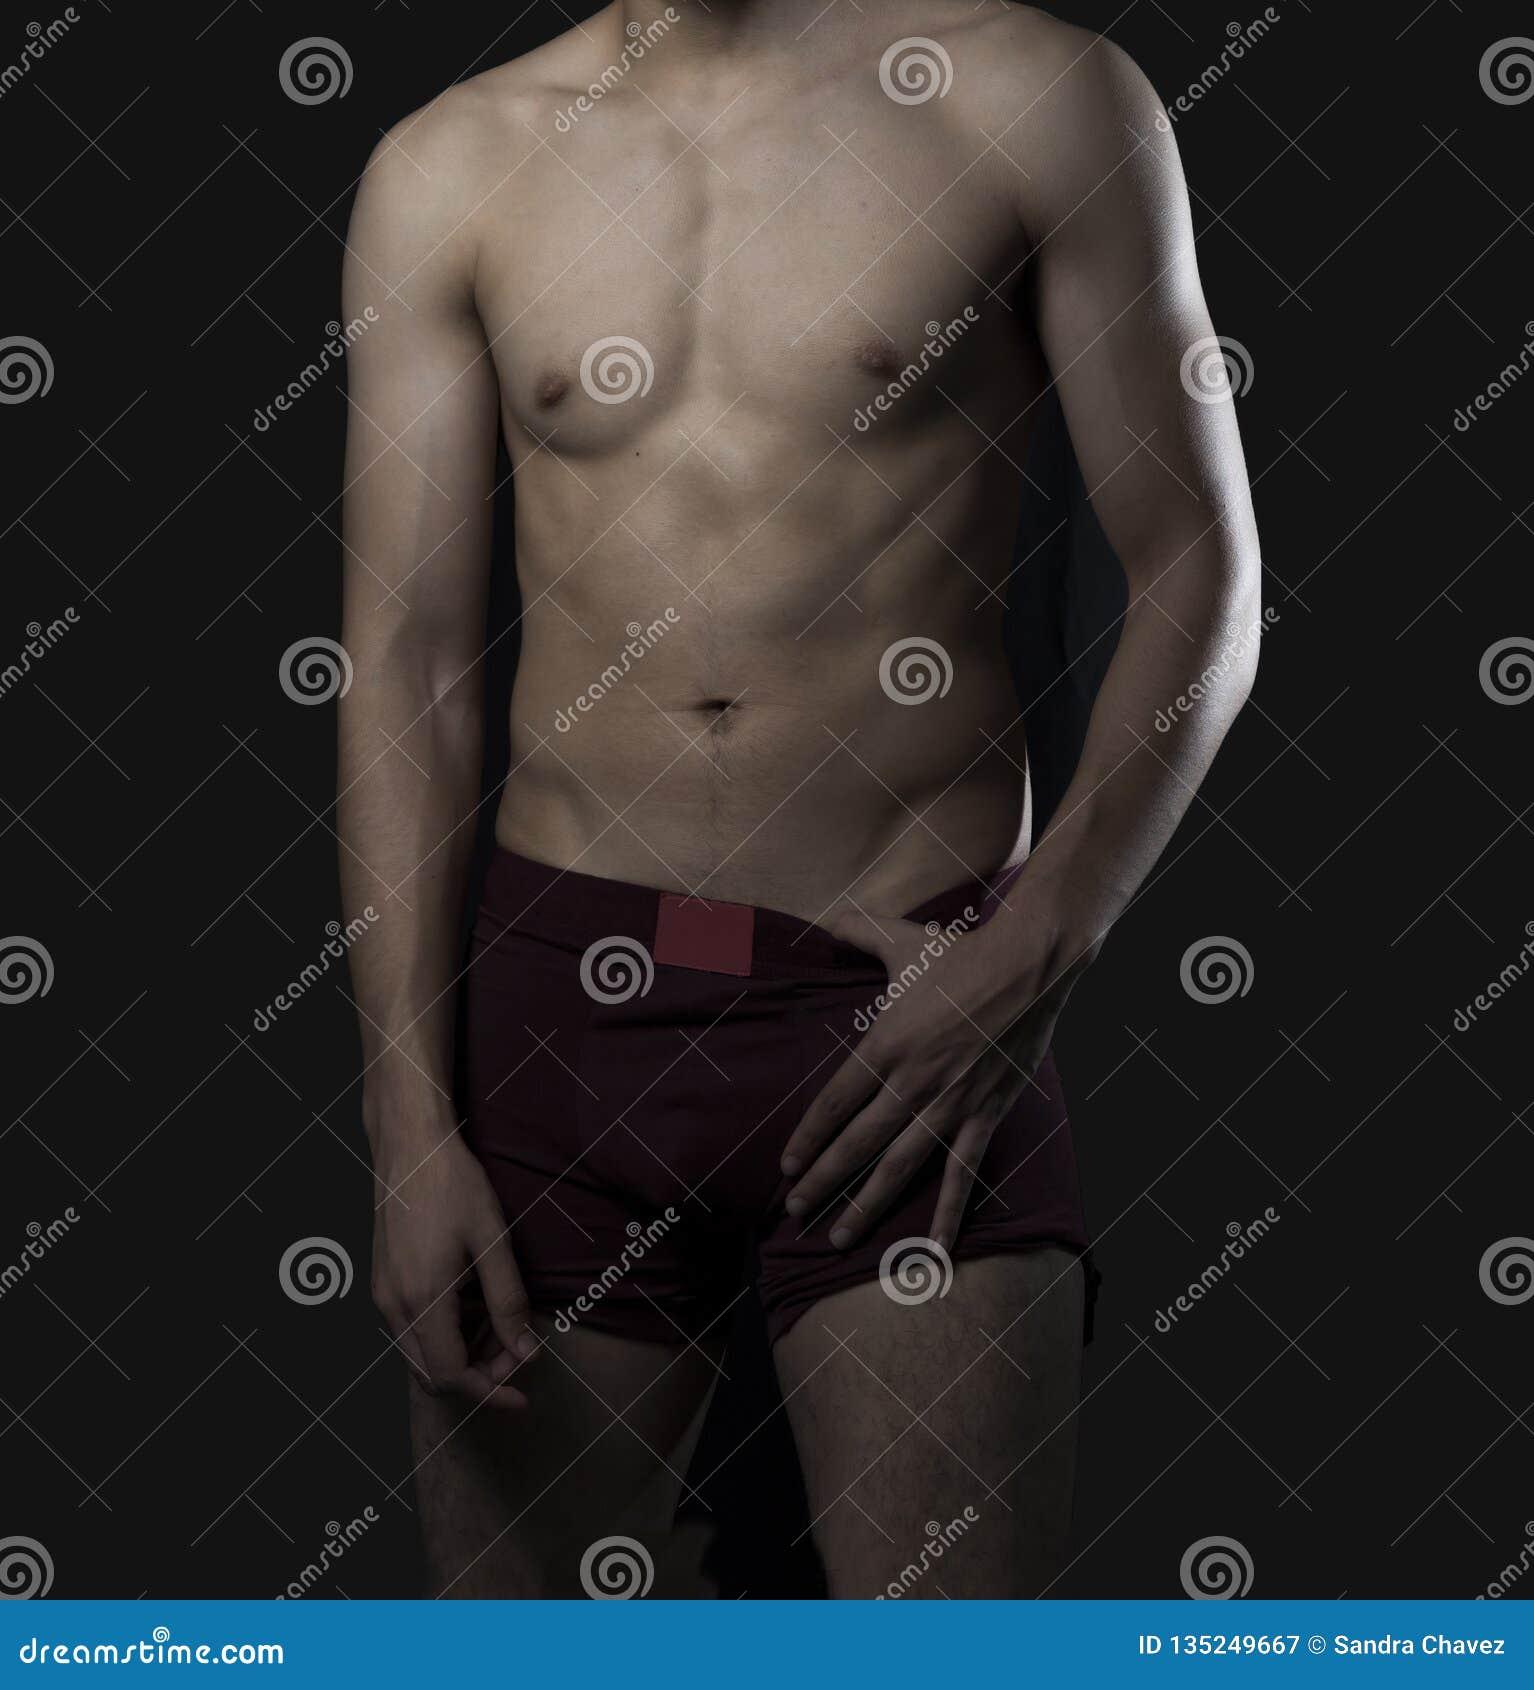 Model in underwear showing her athletic body.